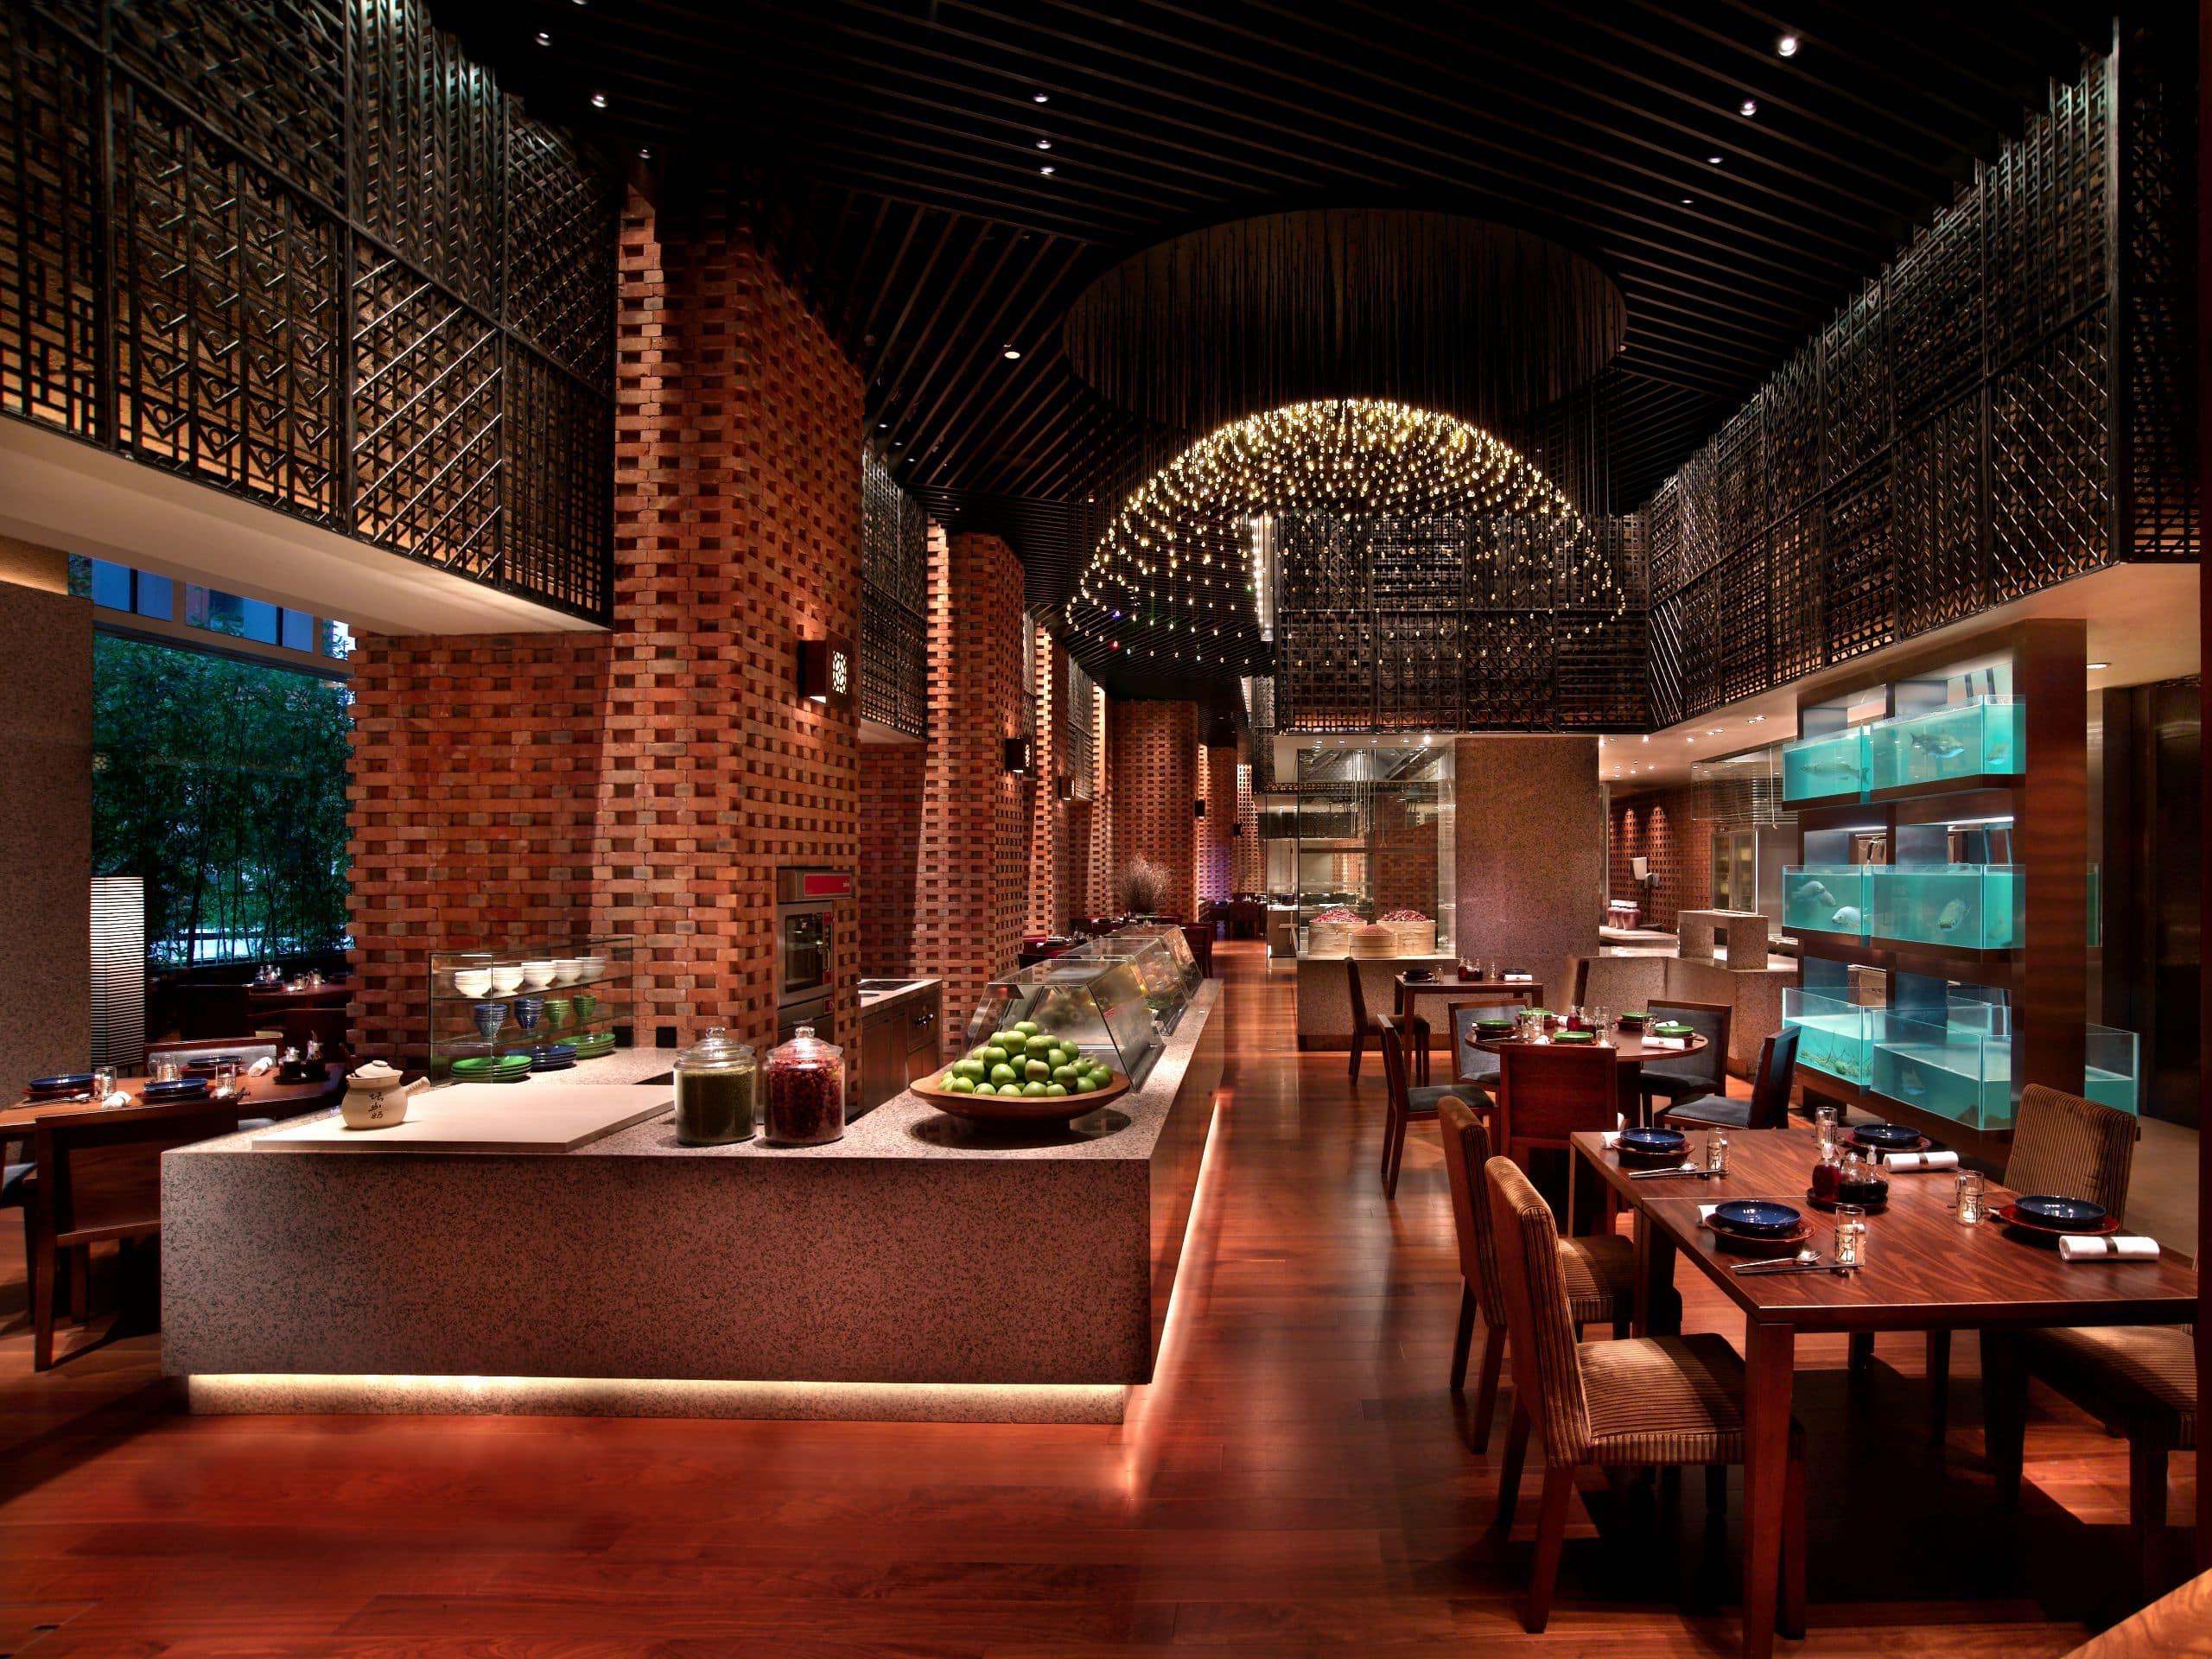 Restaurant In Shenzhen丨grand Hyatt Shenzhen